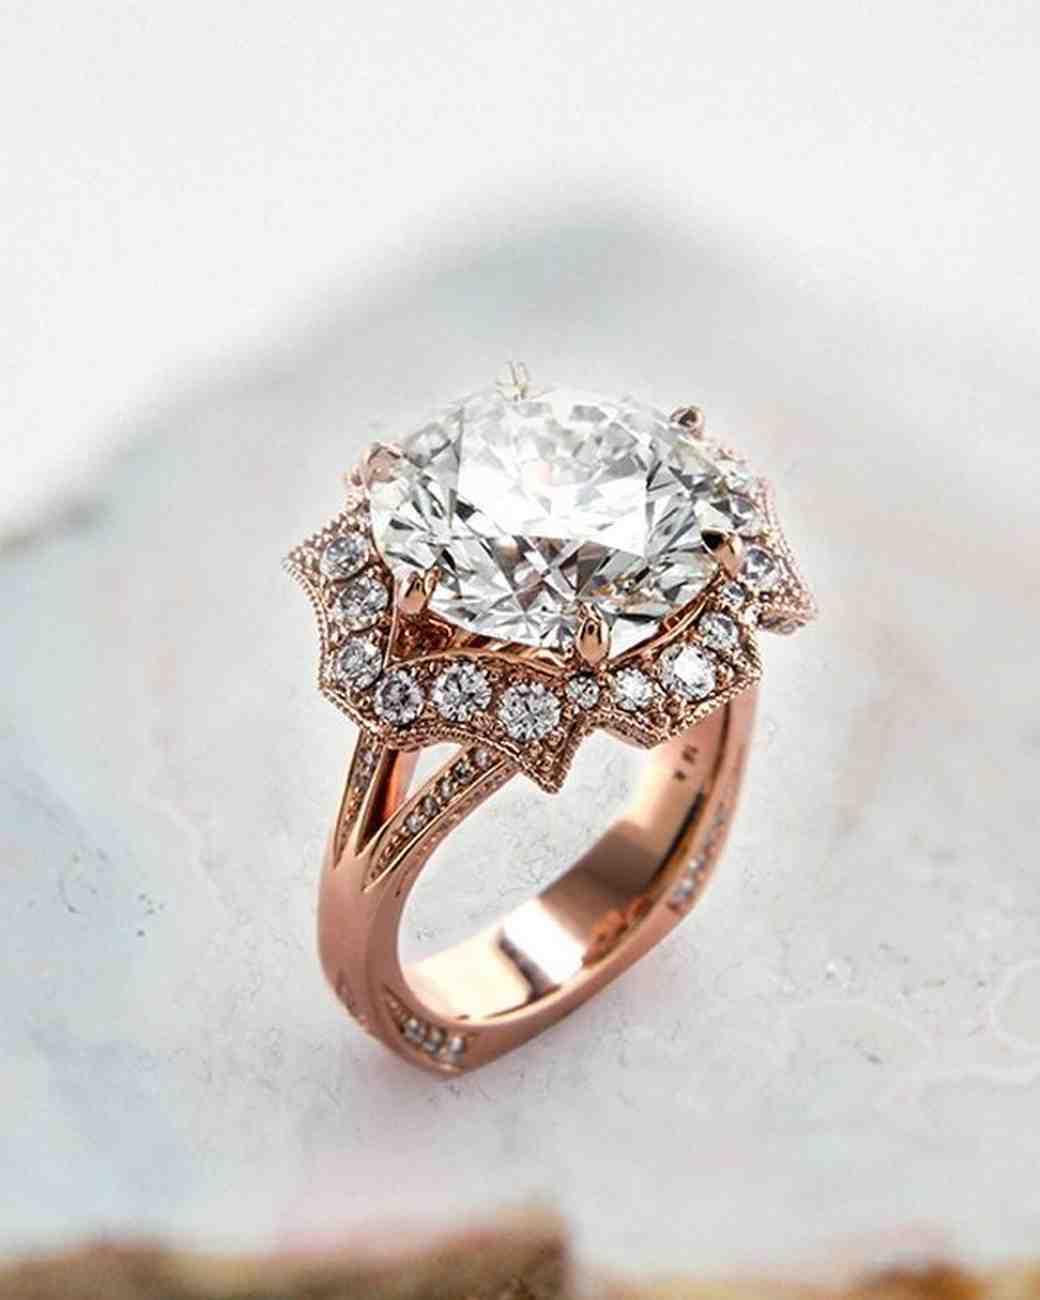 12 Most Unique Engagement Rings For Women